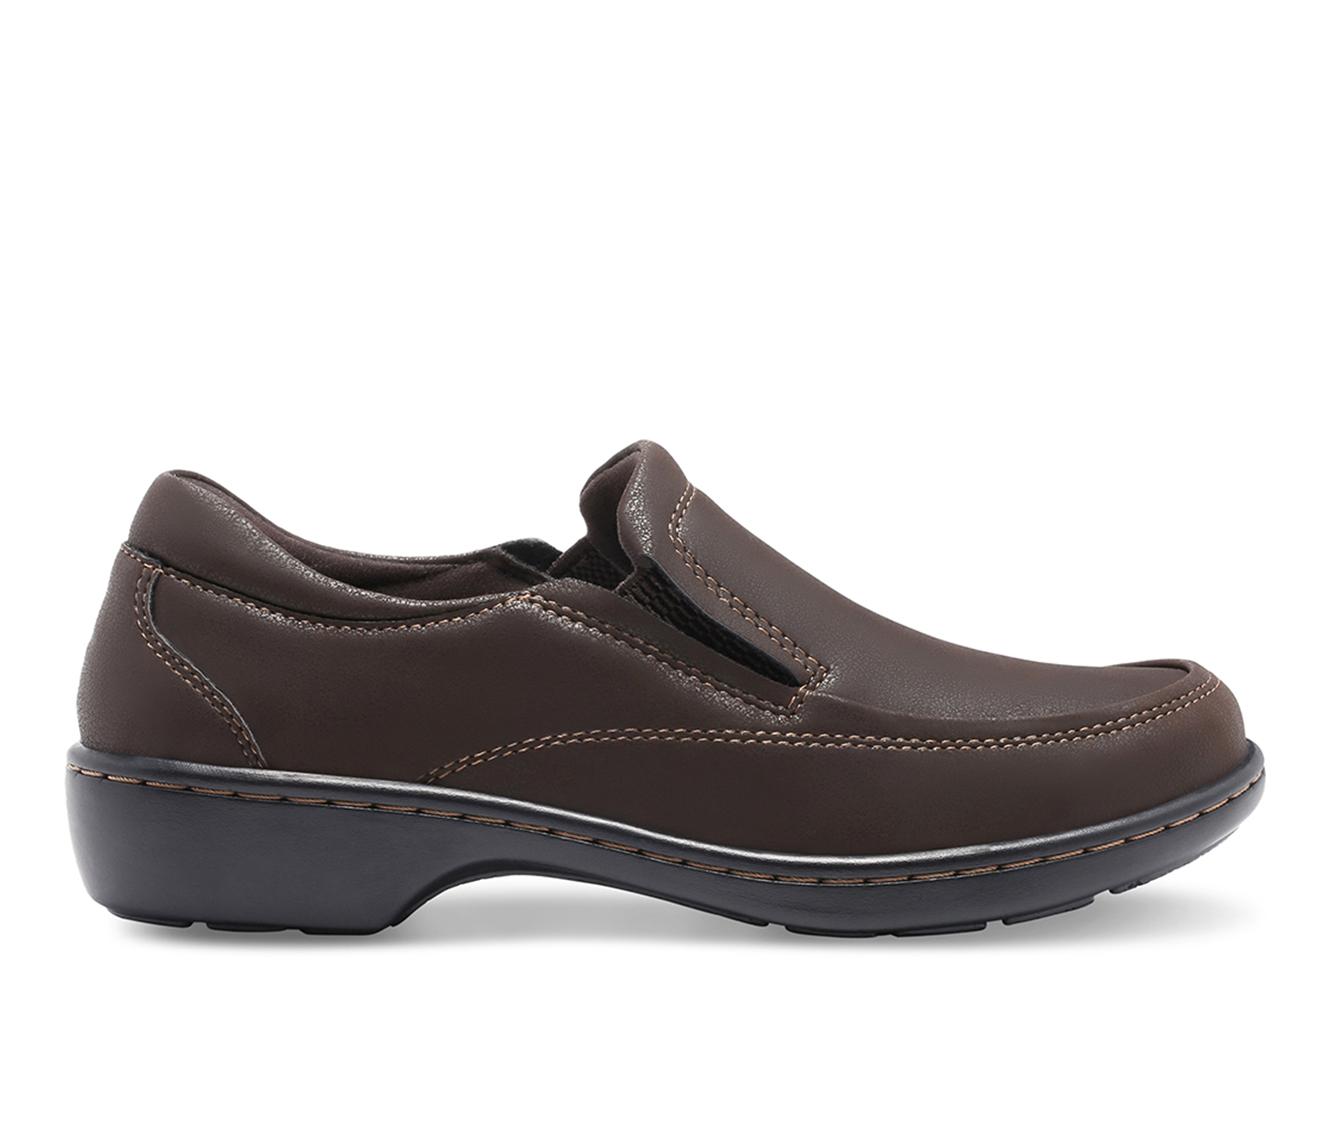 Eastland Molly Women's Shoe (Brown Leather)